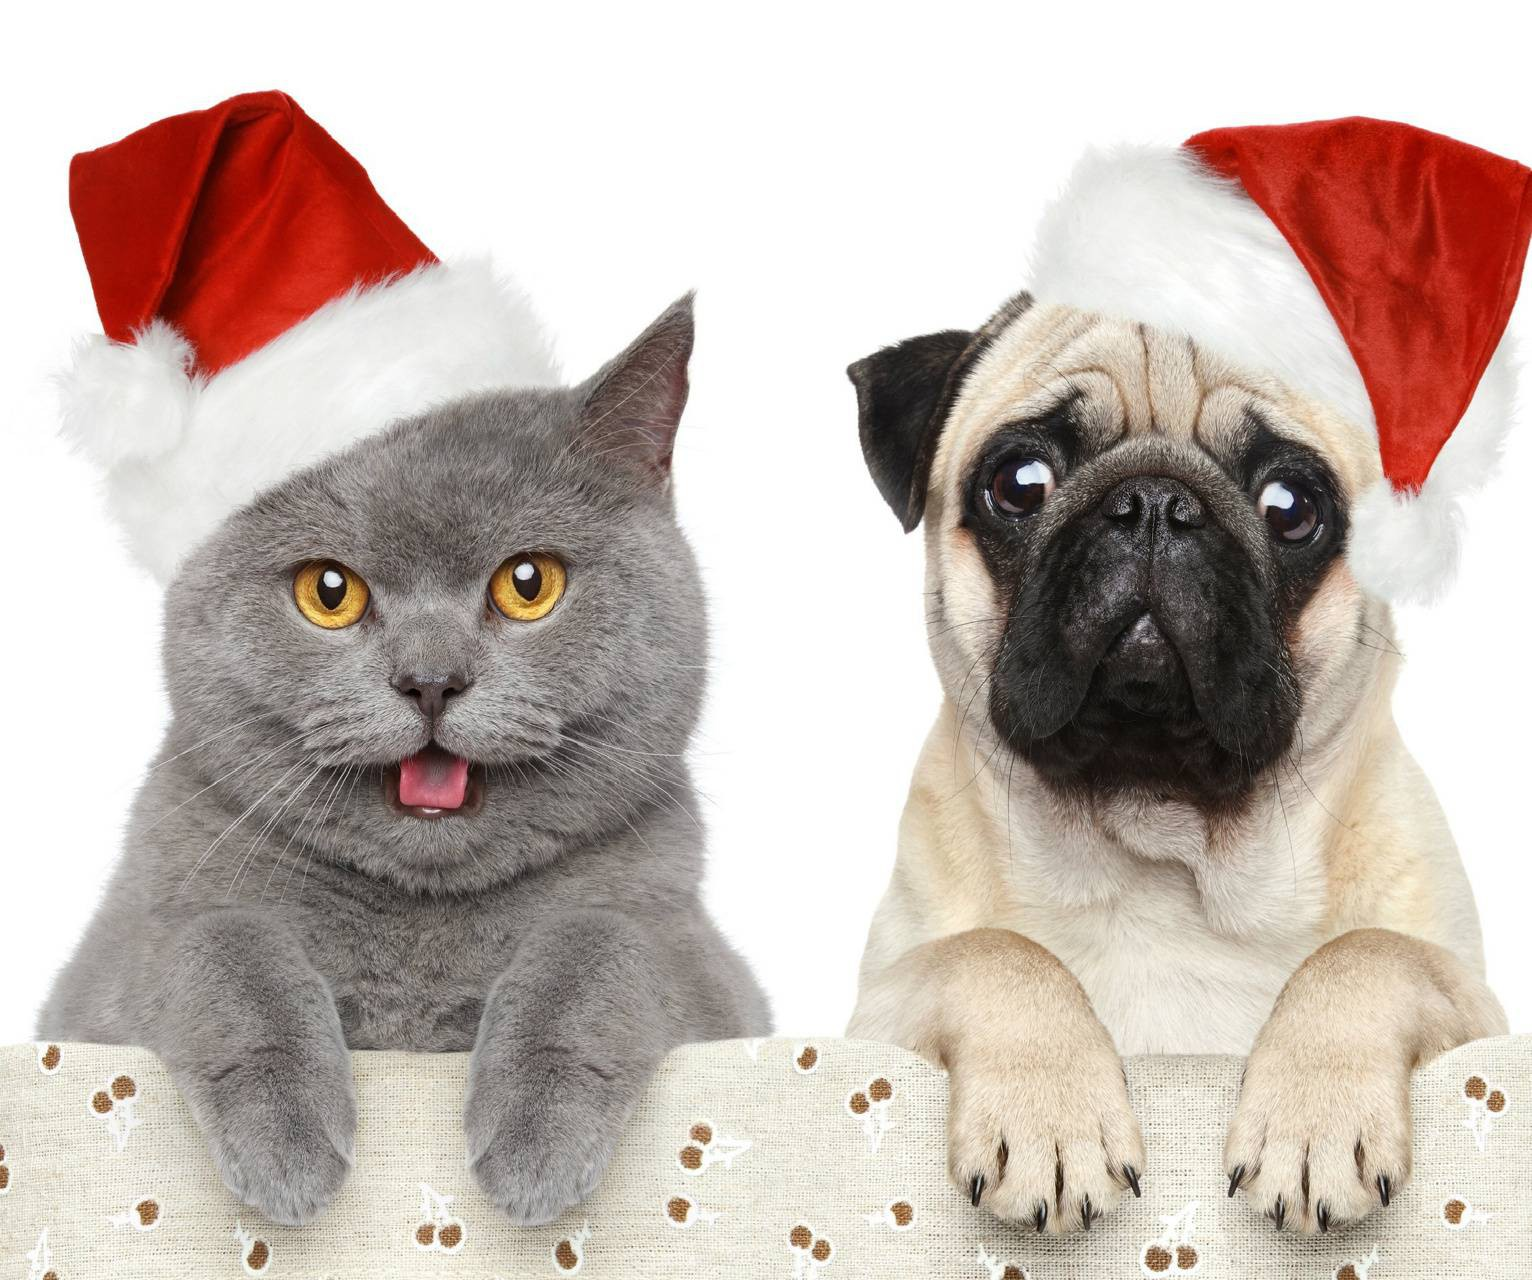 عکس زمینه گربه و سگ با کلاه کریسمس پس زمینه